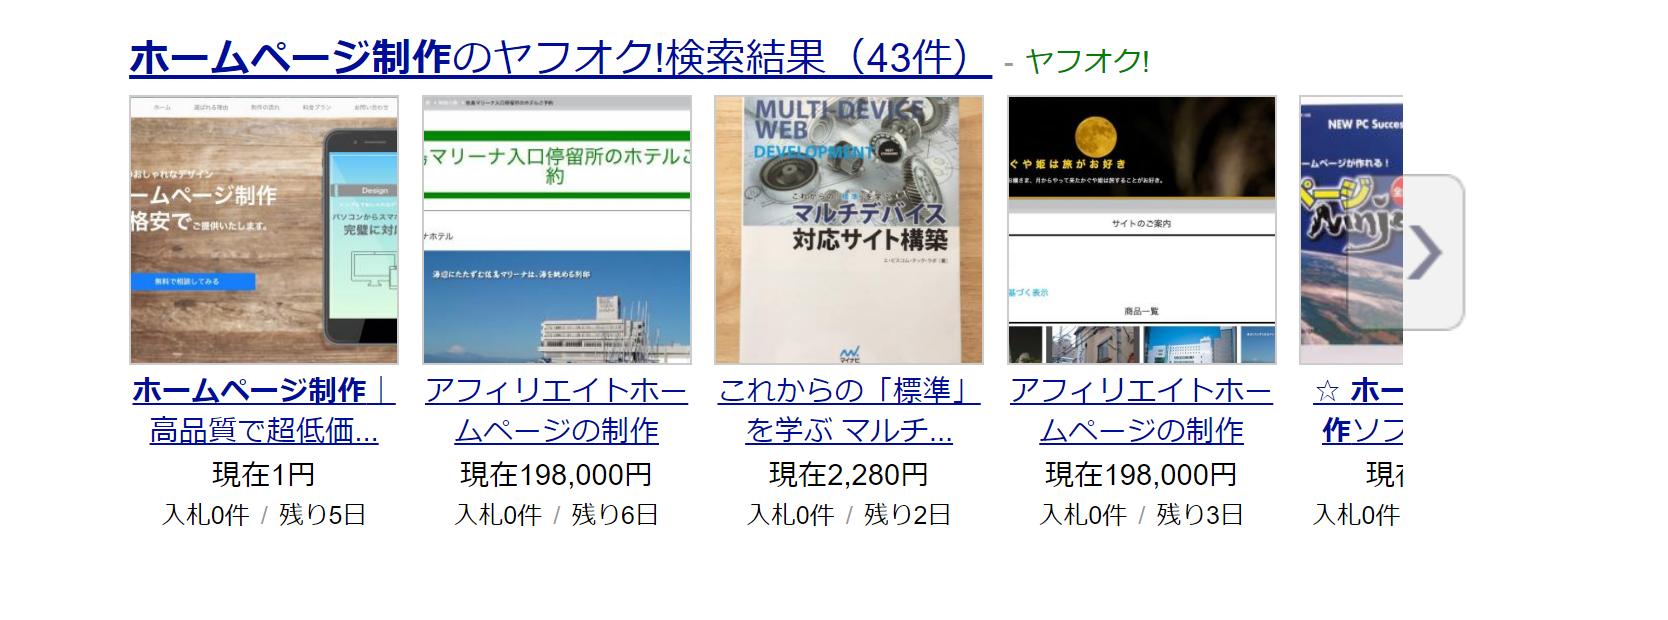 Yahooの検索結果に差し込み表示されるヤフオクの検索結果